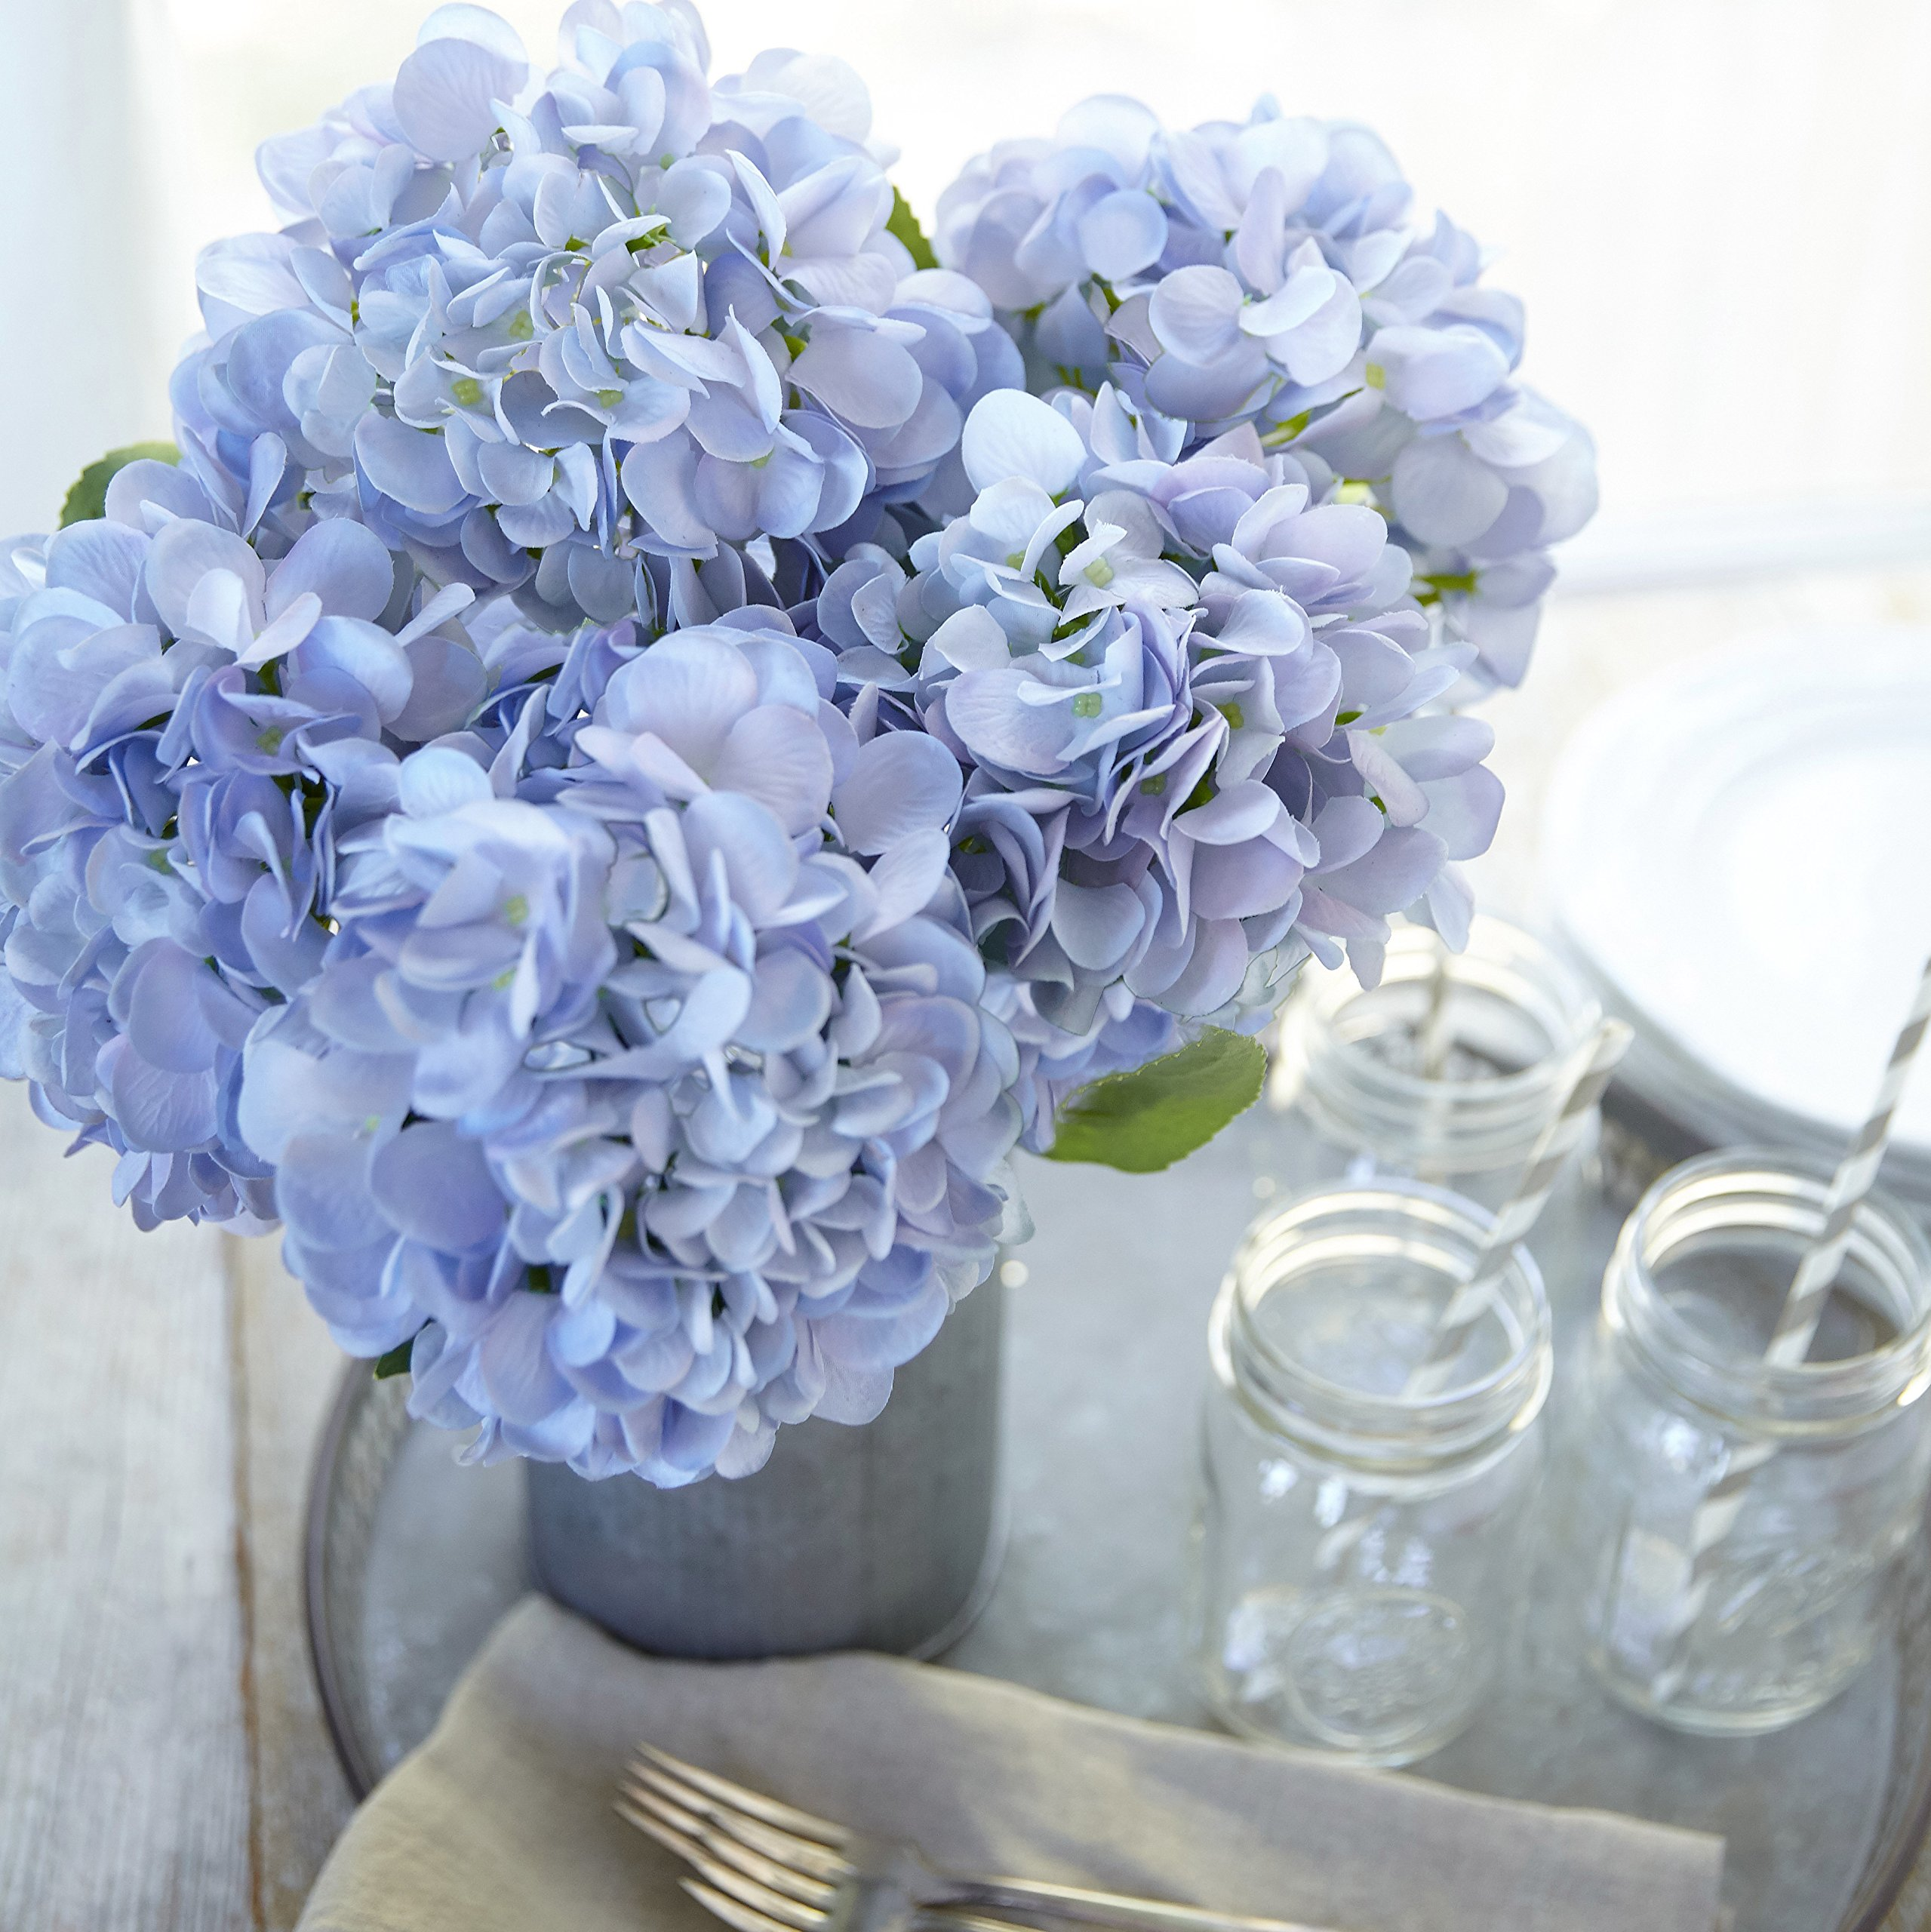 Butterfly Craze Artificial Hydrangea Silk Flowers For Wedding